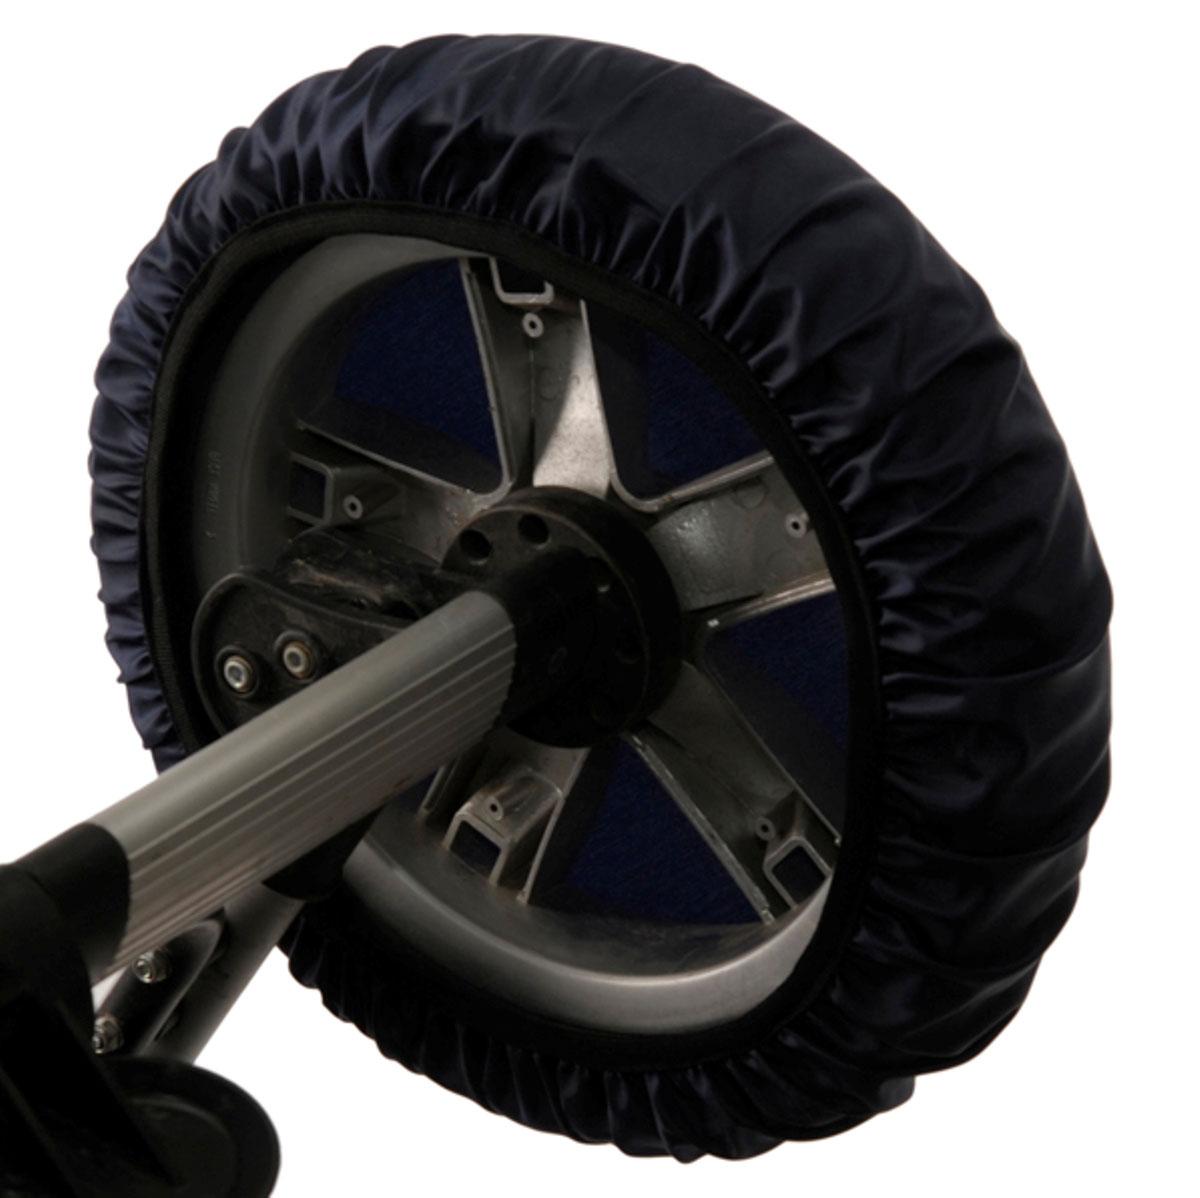 Чудо-Чадо Чехлы на колеса для коляски диаметр 28-38 см цвет темно-синий 4 шт